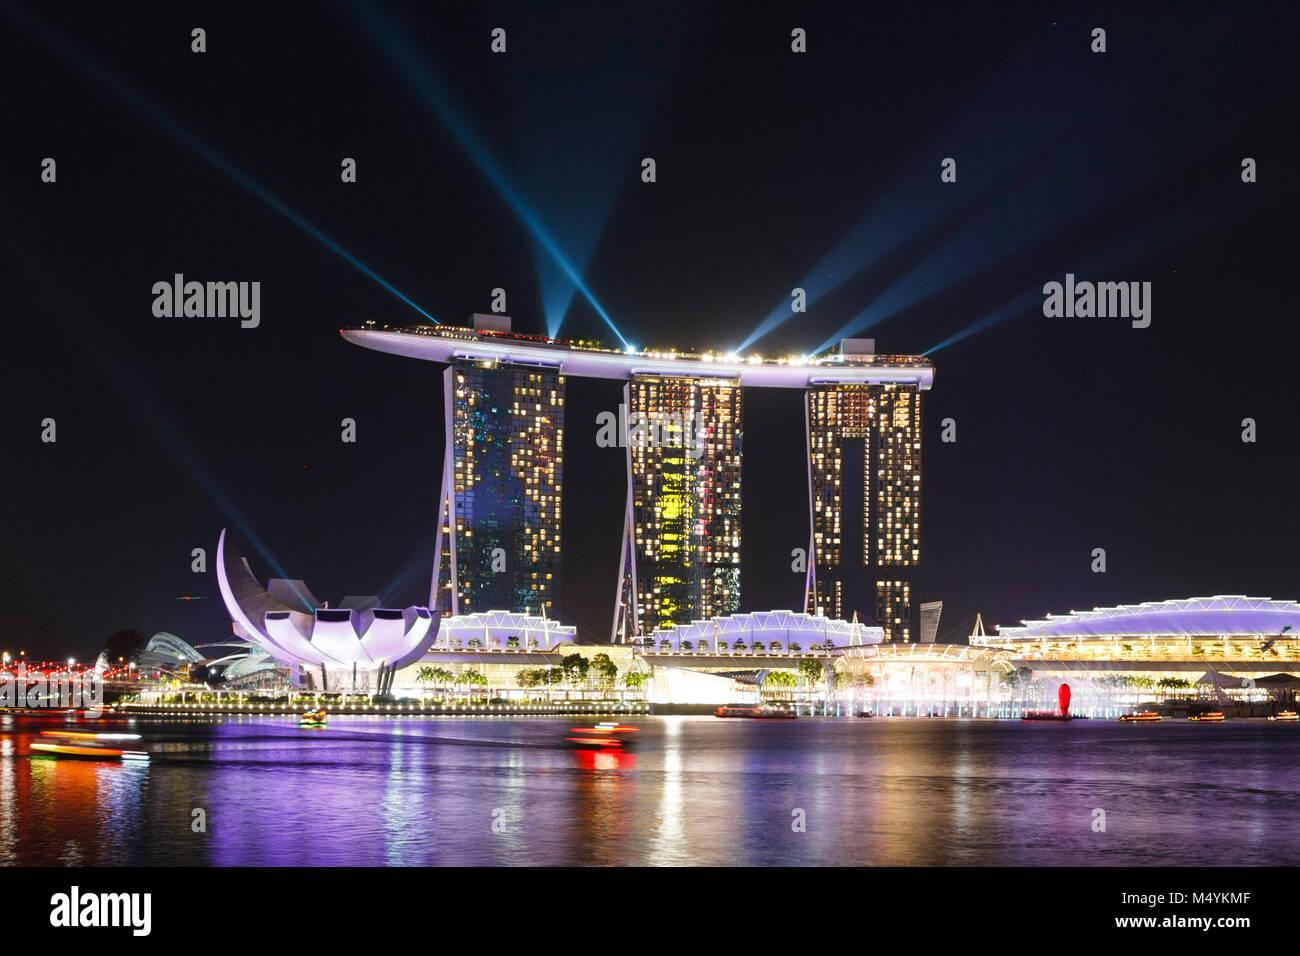 Marina Bay Sands hotel lit up at night, Singapore - Stock Image